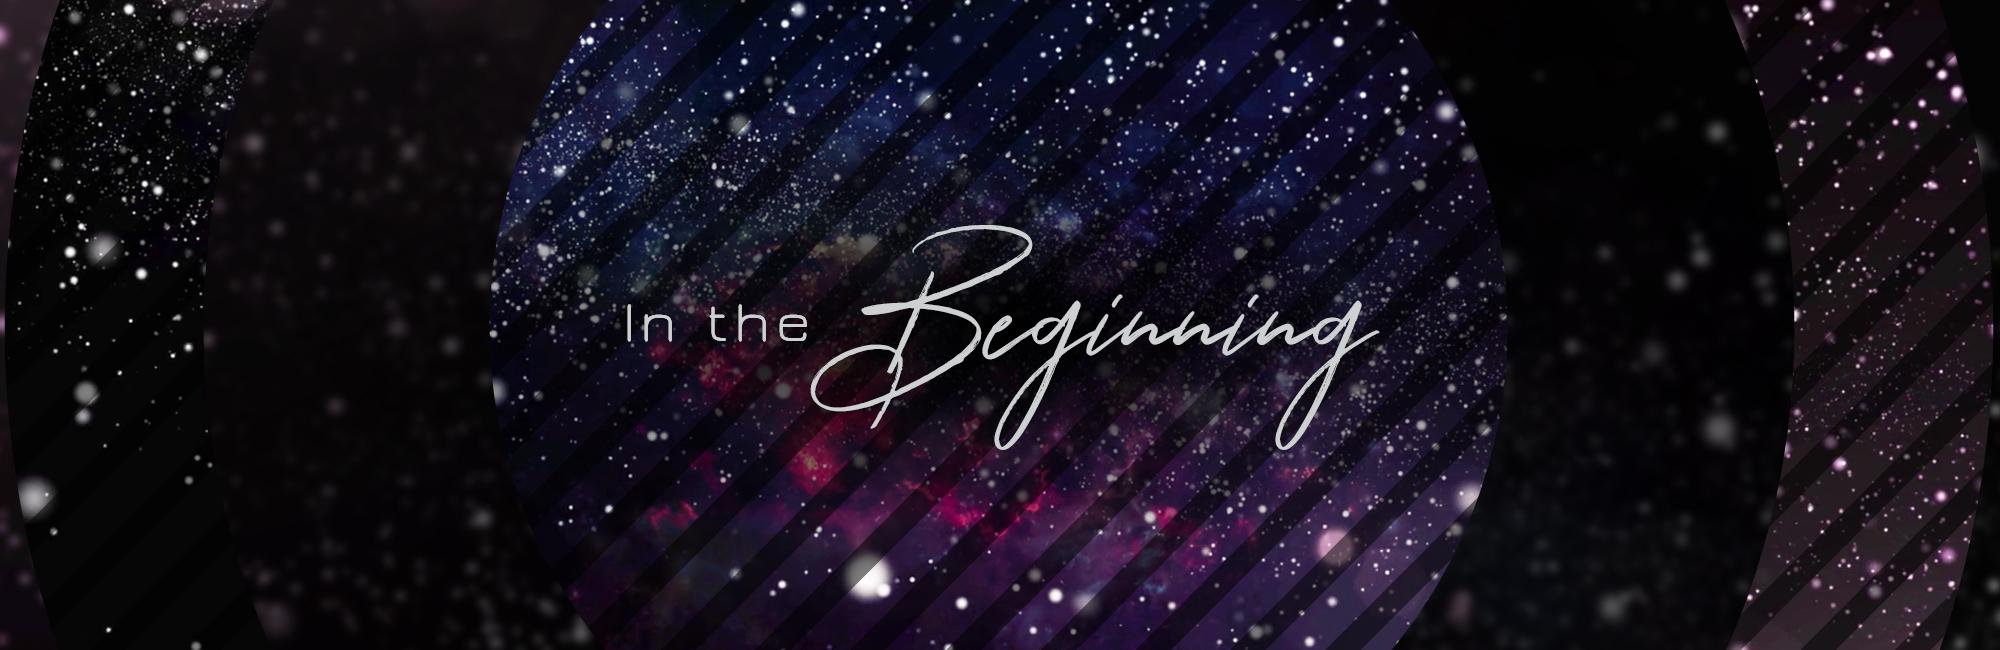 In the Beginning - Sermon Web Header